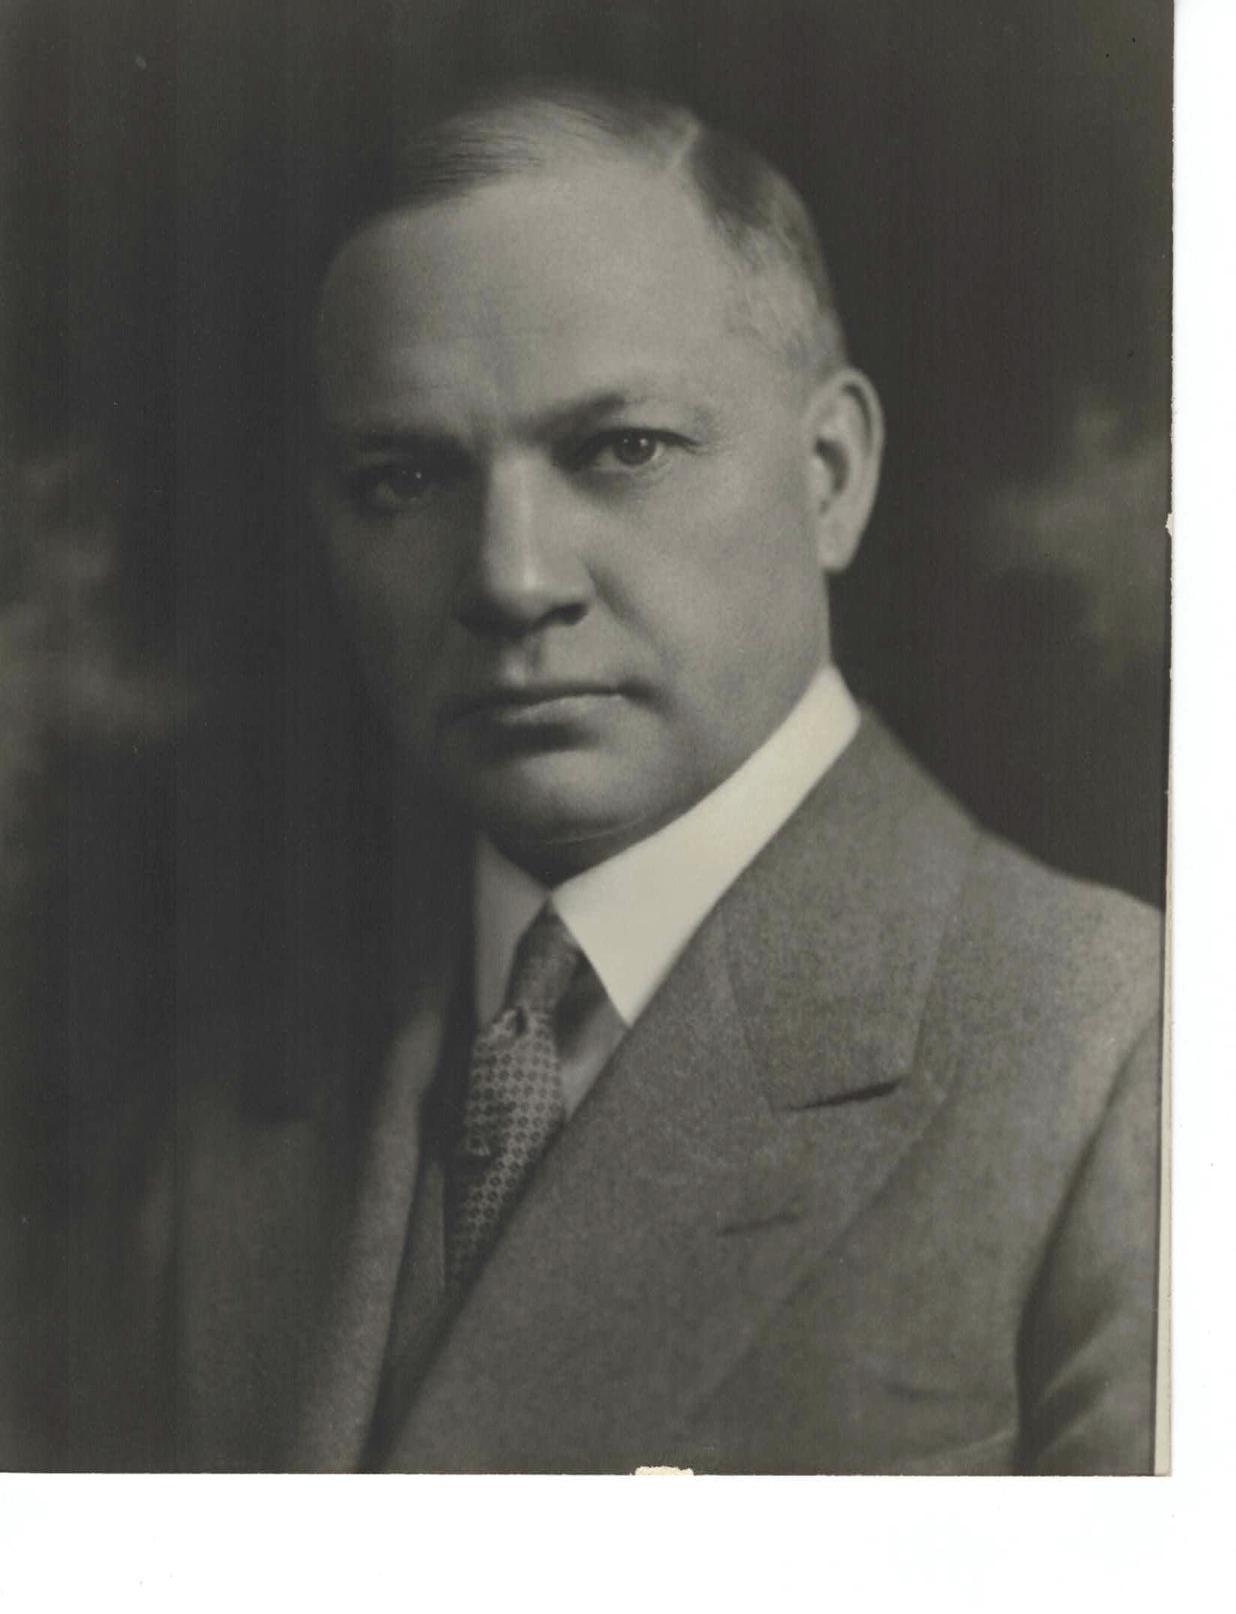 FRANK P. HELSELL 1929-30